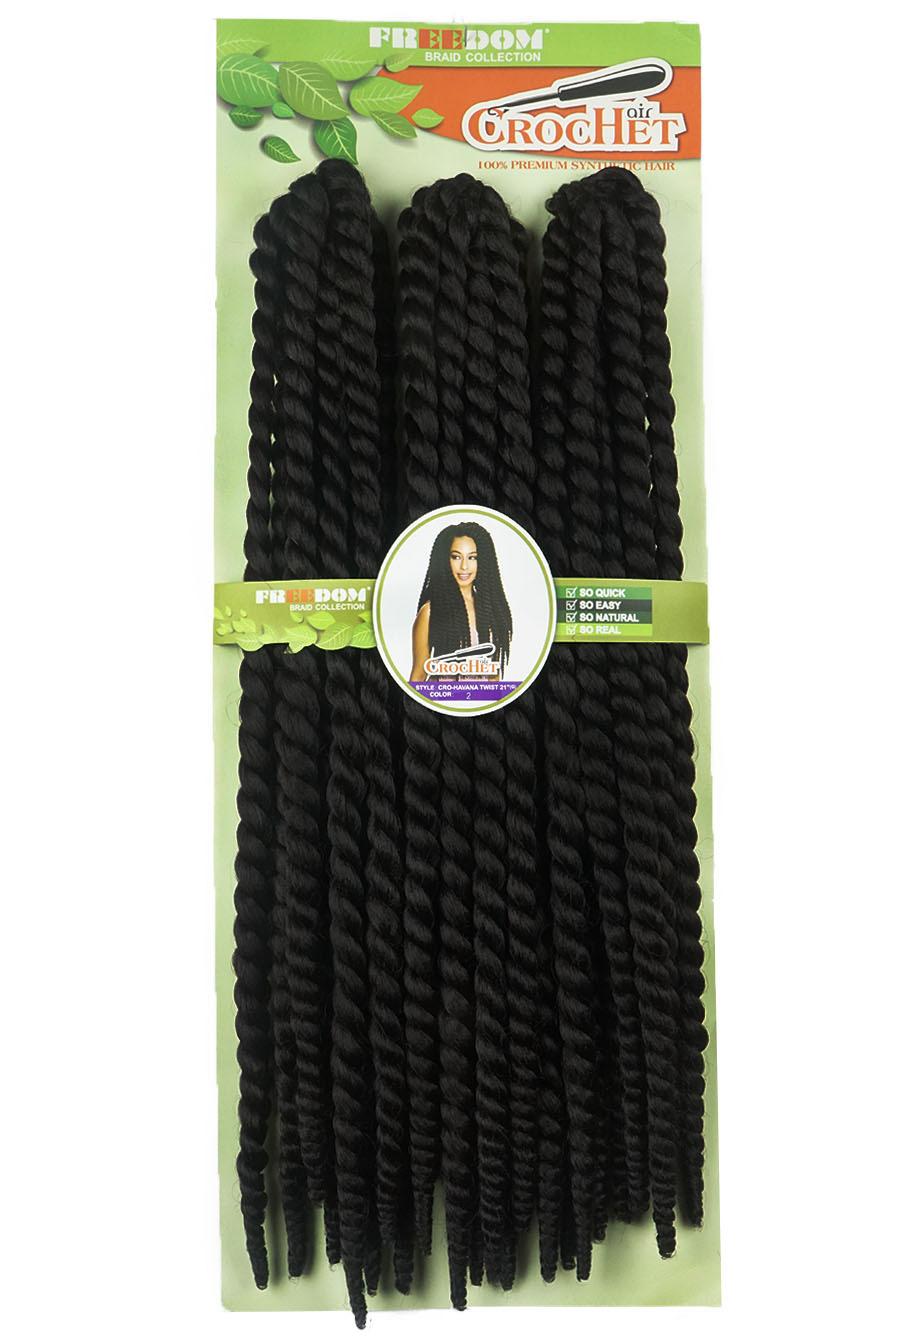 Cabelo Sintético - Freedom - Havana Twist 21' (Crochet Braid)